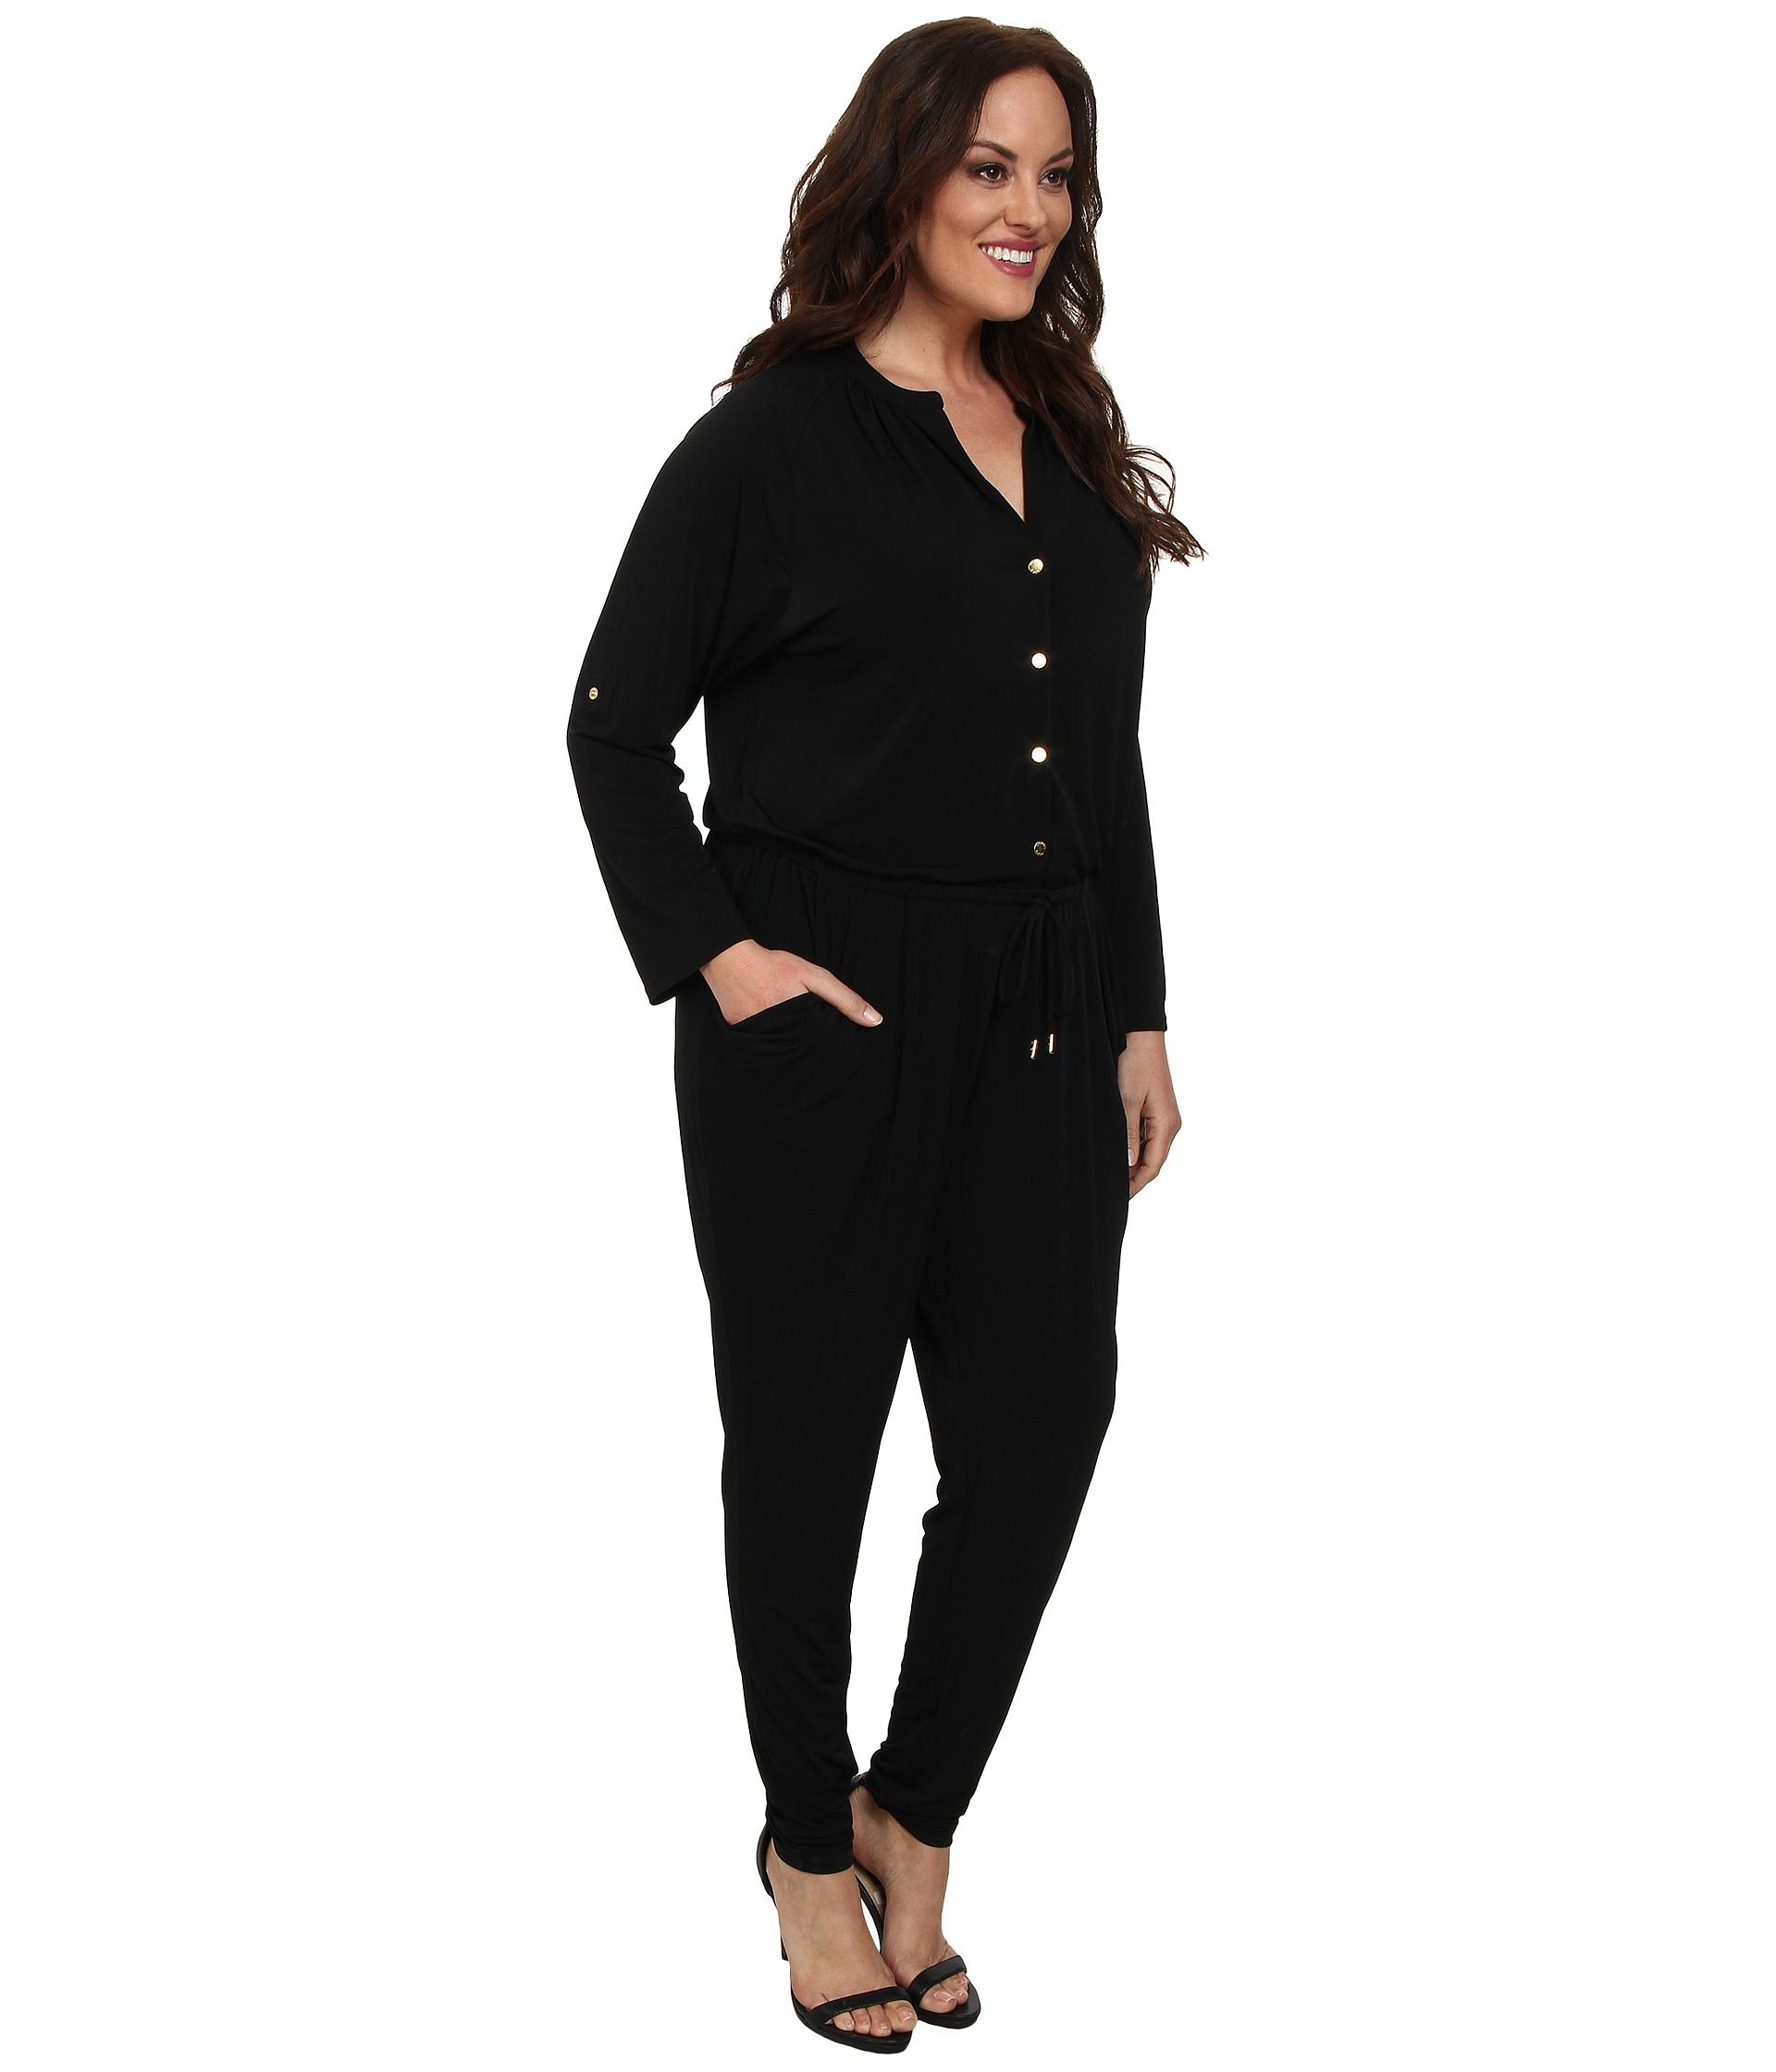 b5c1dc47d0c Lyst - MICHAEL Michael Kors Plus Size Roll Sleeve Raglan Jumpsuit in ...